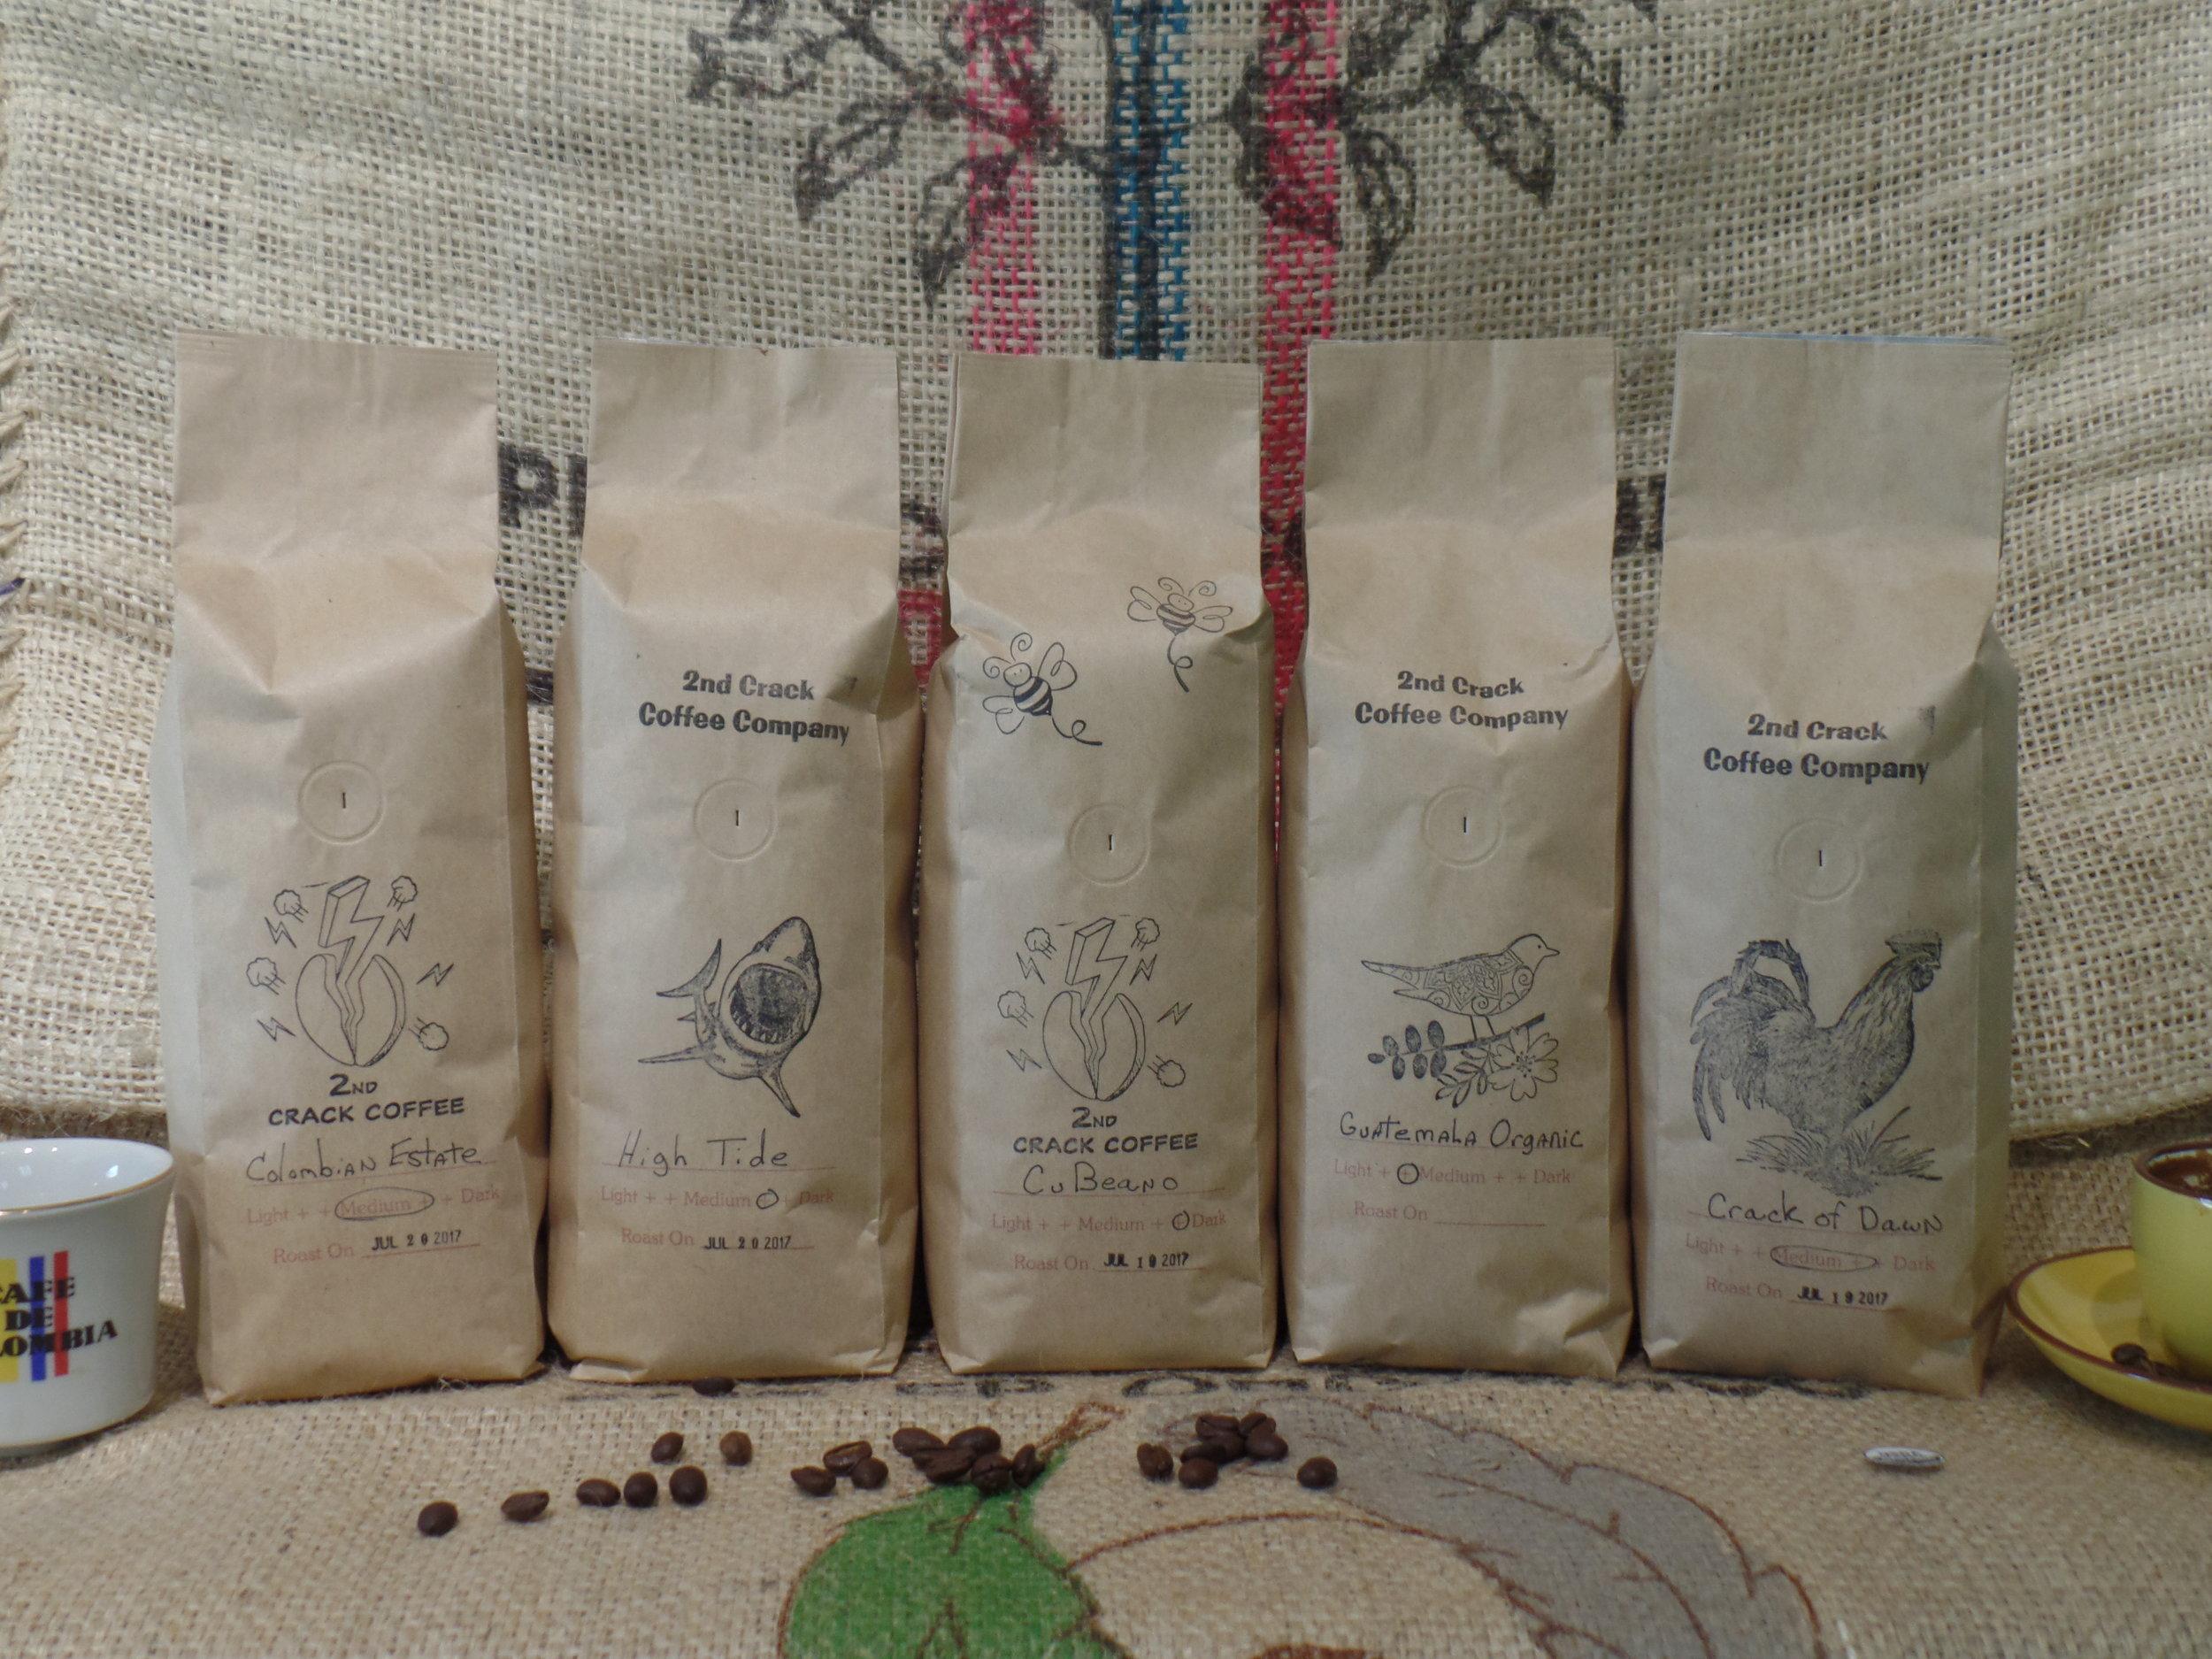 Farmers Market, Online Farmers Market, 2nd Crack Coffee, Artisan Coffee Brand